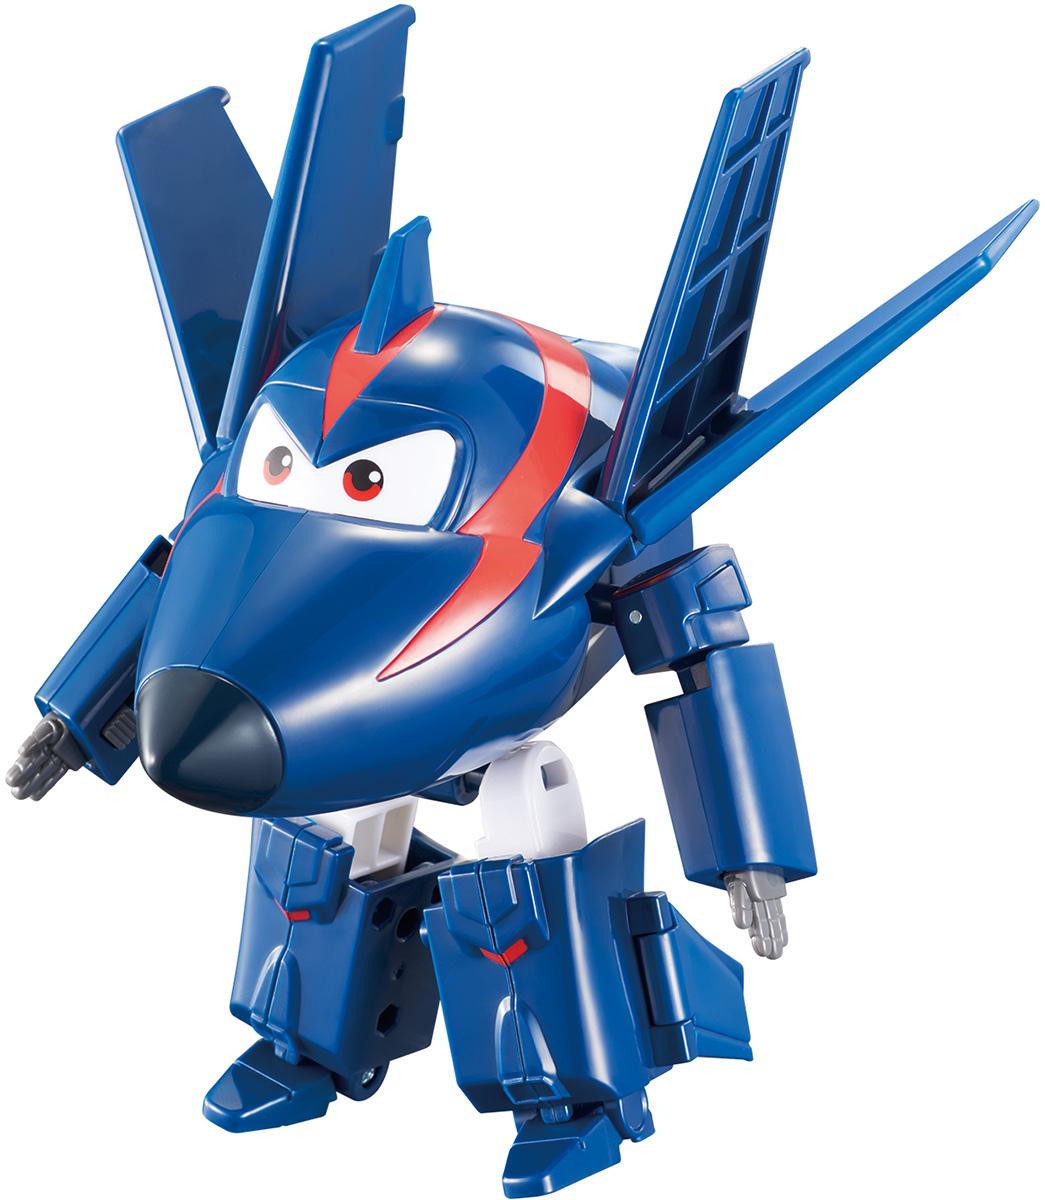 Super Wings Трансформер Чейз EU720223